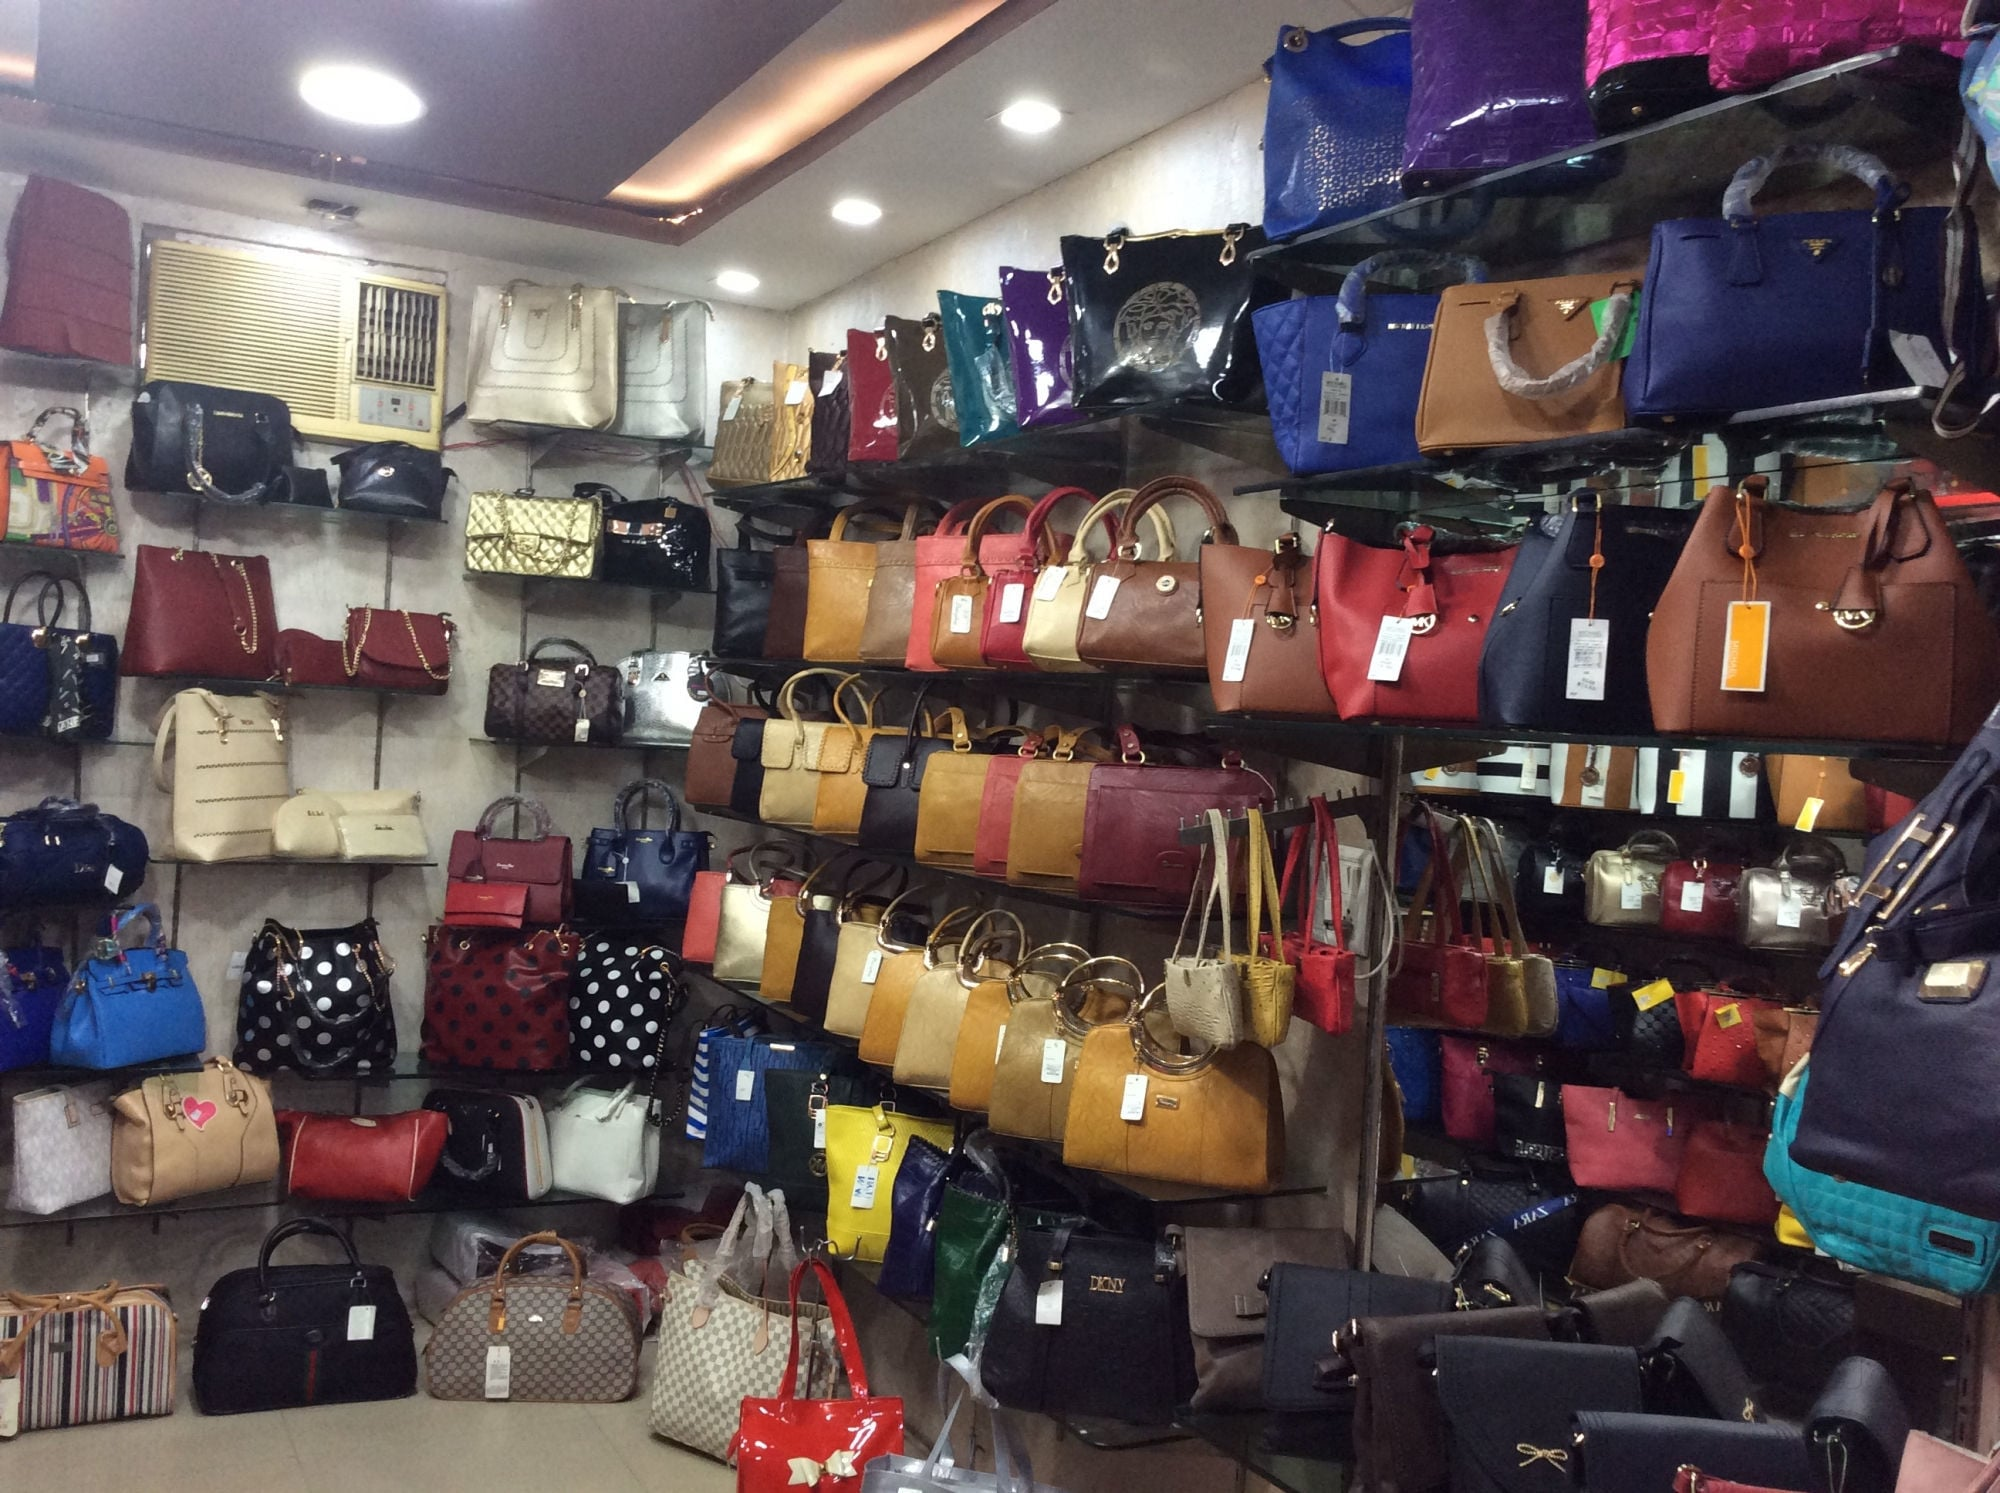 395cdc96d198 Top Baggit Women Bag Dealers in Mohali - Best Baggit Women Bag Dealers  CHANDIGARH - Justdial